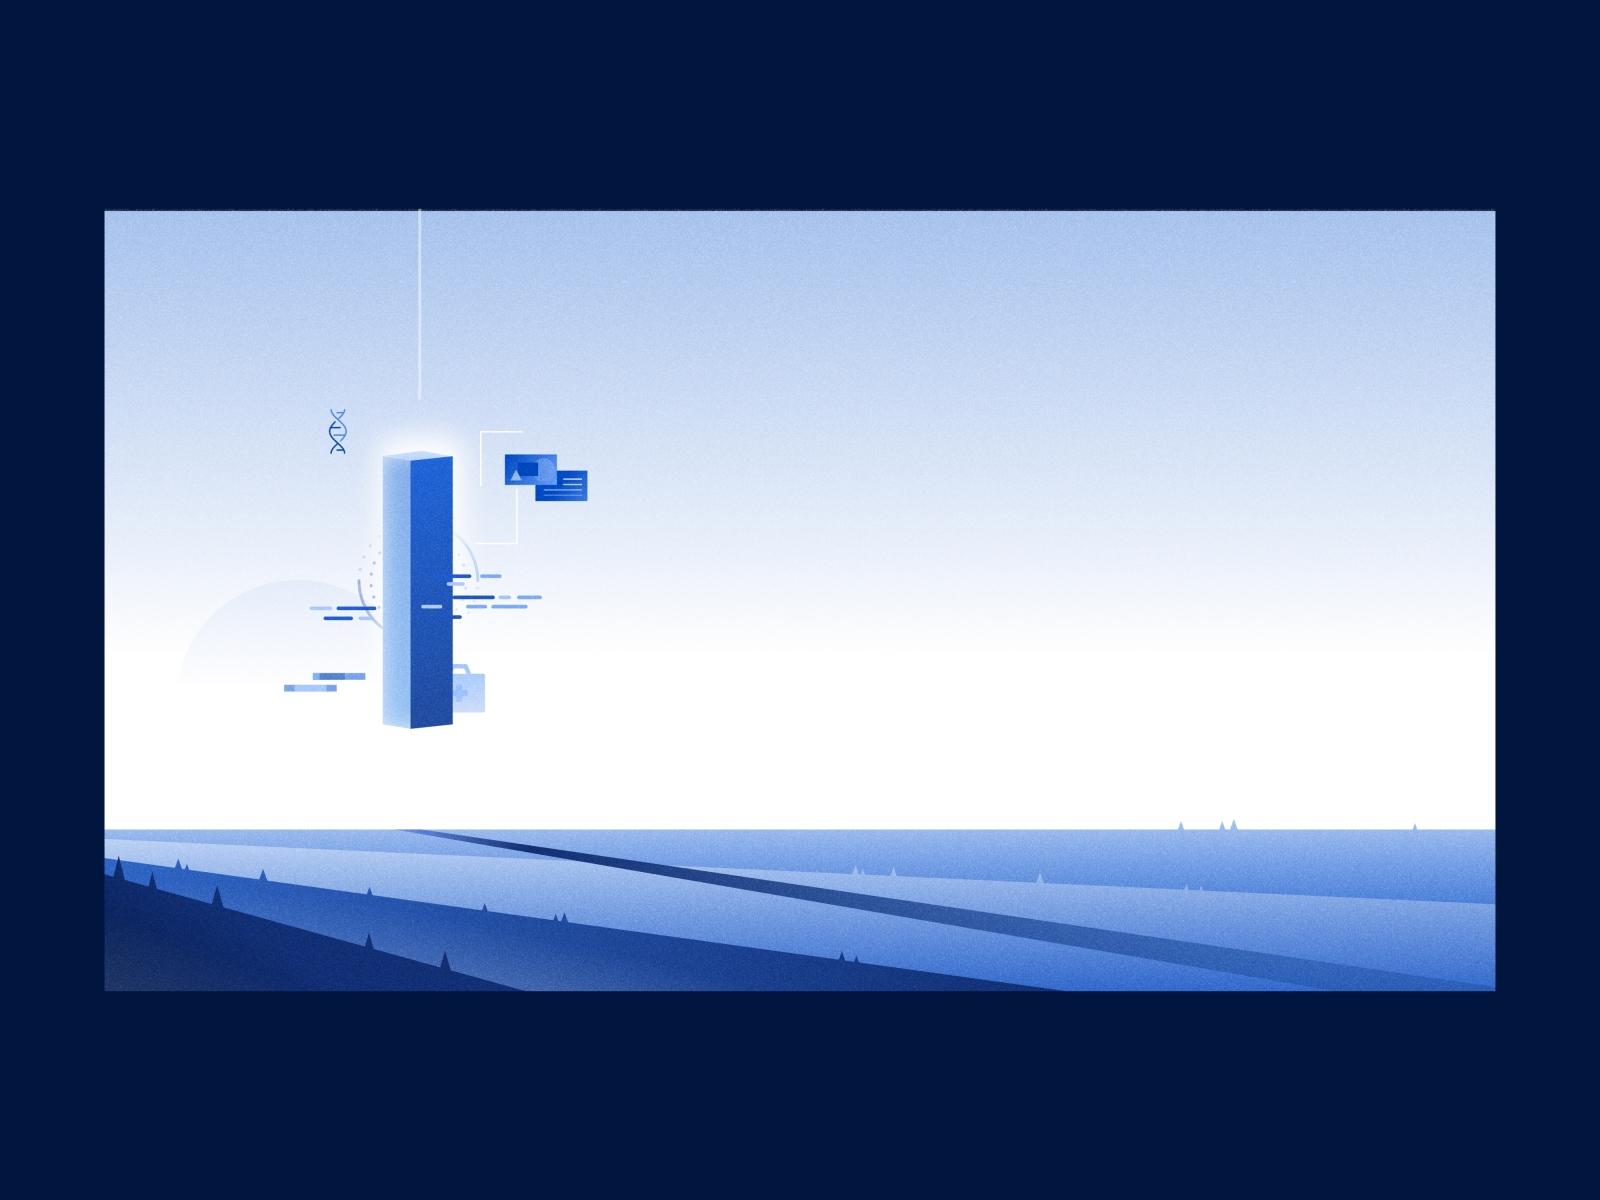 Abstract Illustration - Monolith 🗿☁️